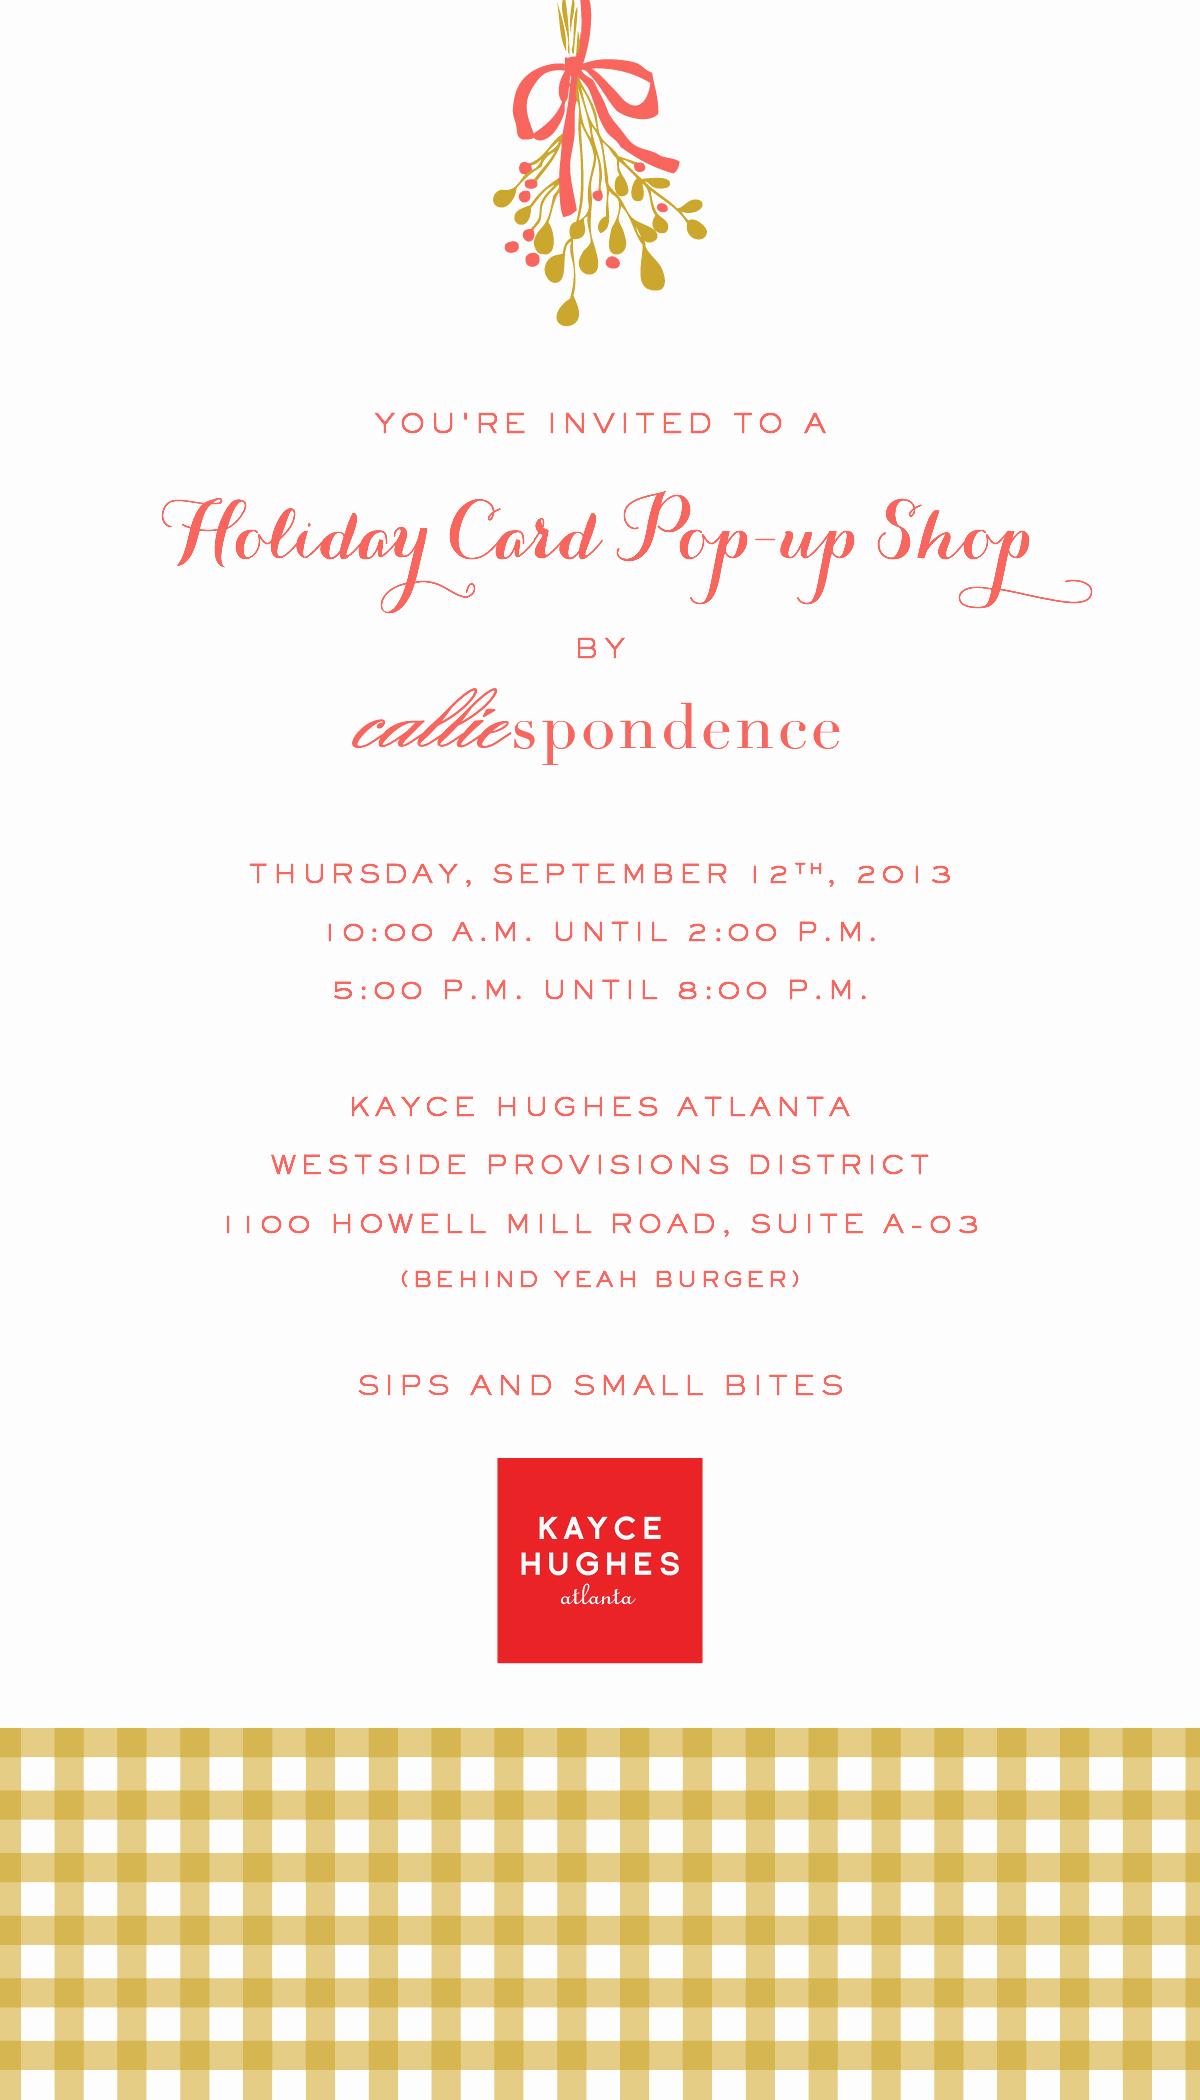 Pop Up Shop Invitation New Holiday Card Pop Up Shop – Thursday September 12th